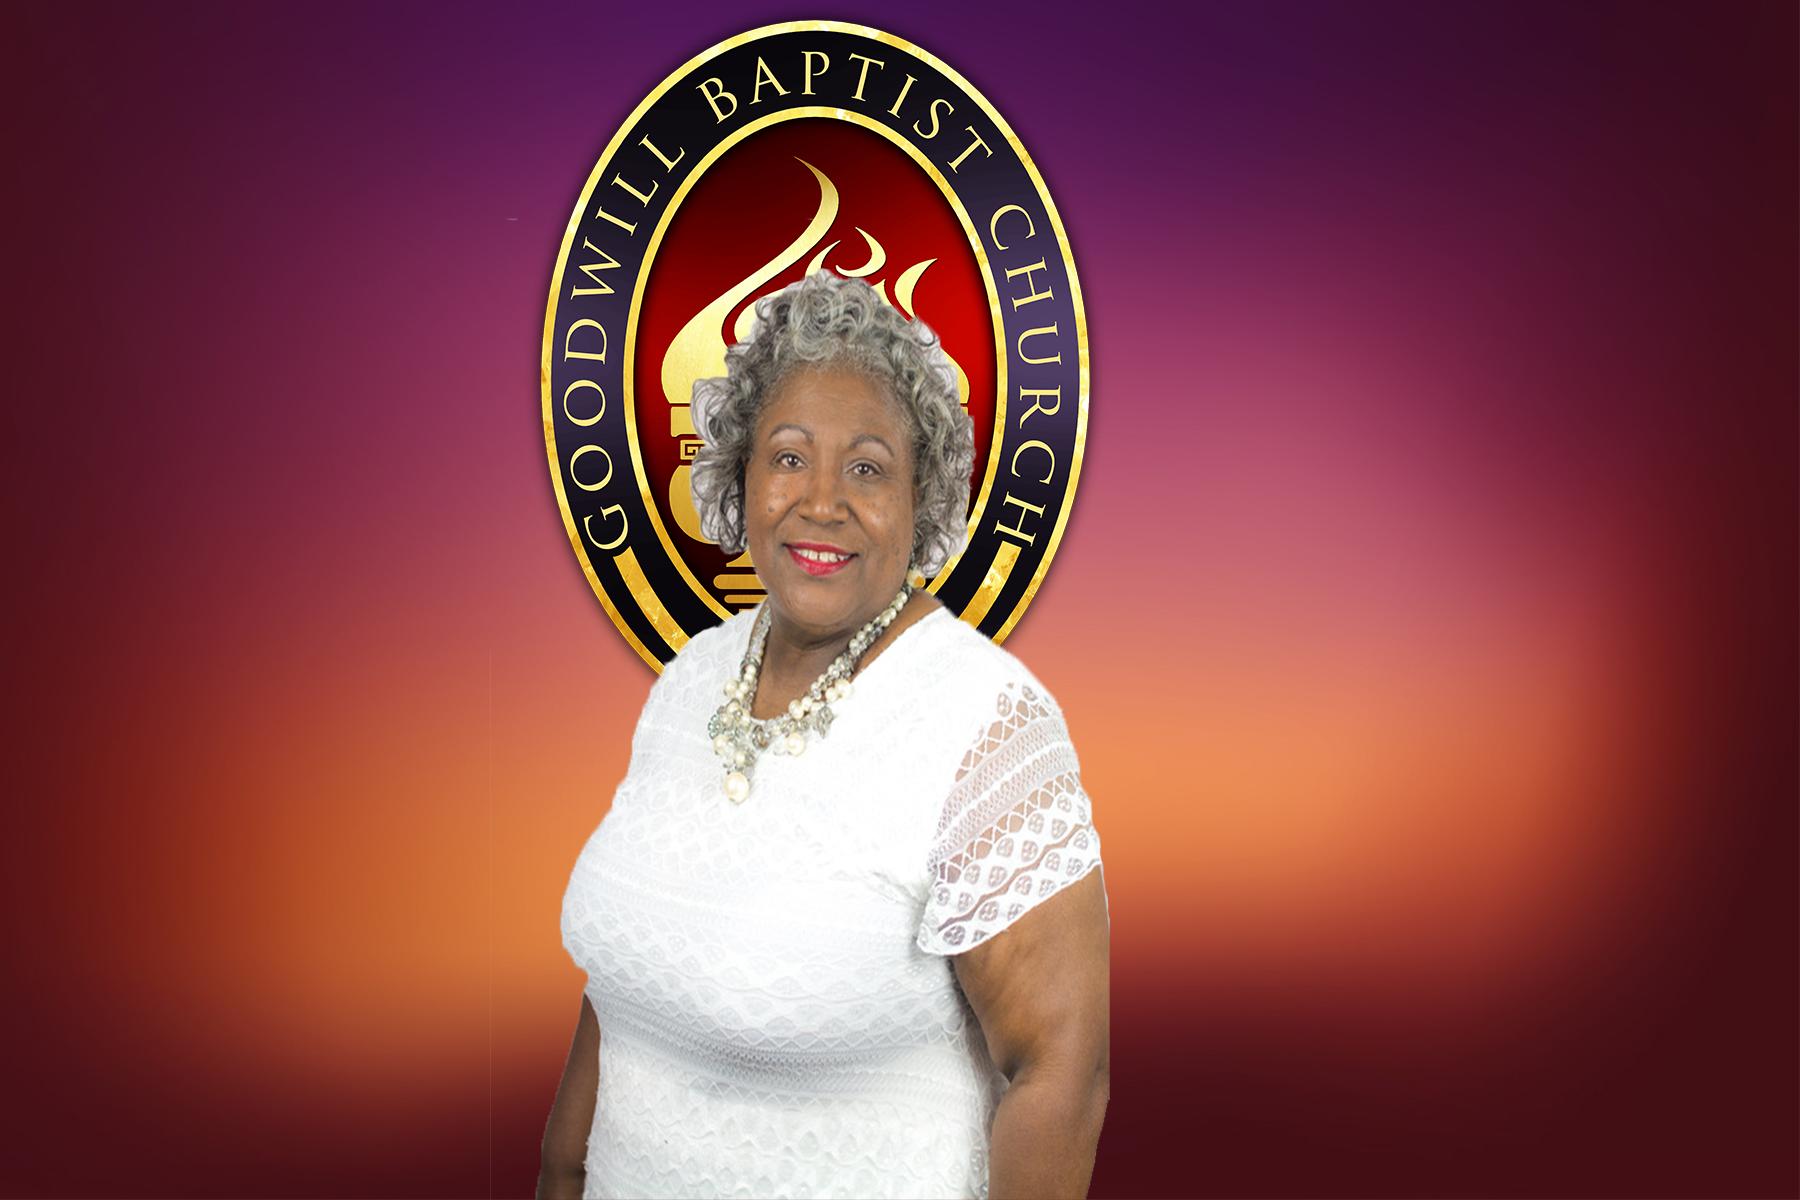 Pastor Alberta Cuthrell - Christian Education